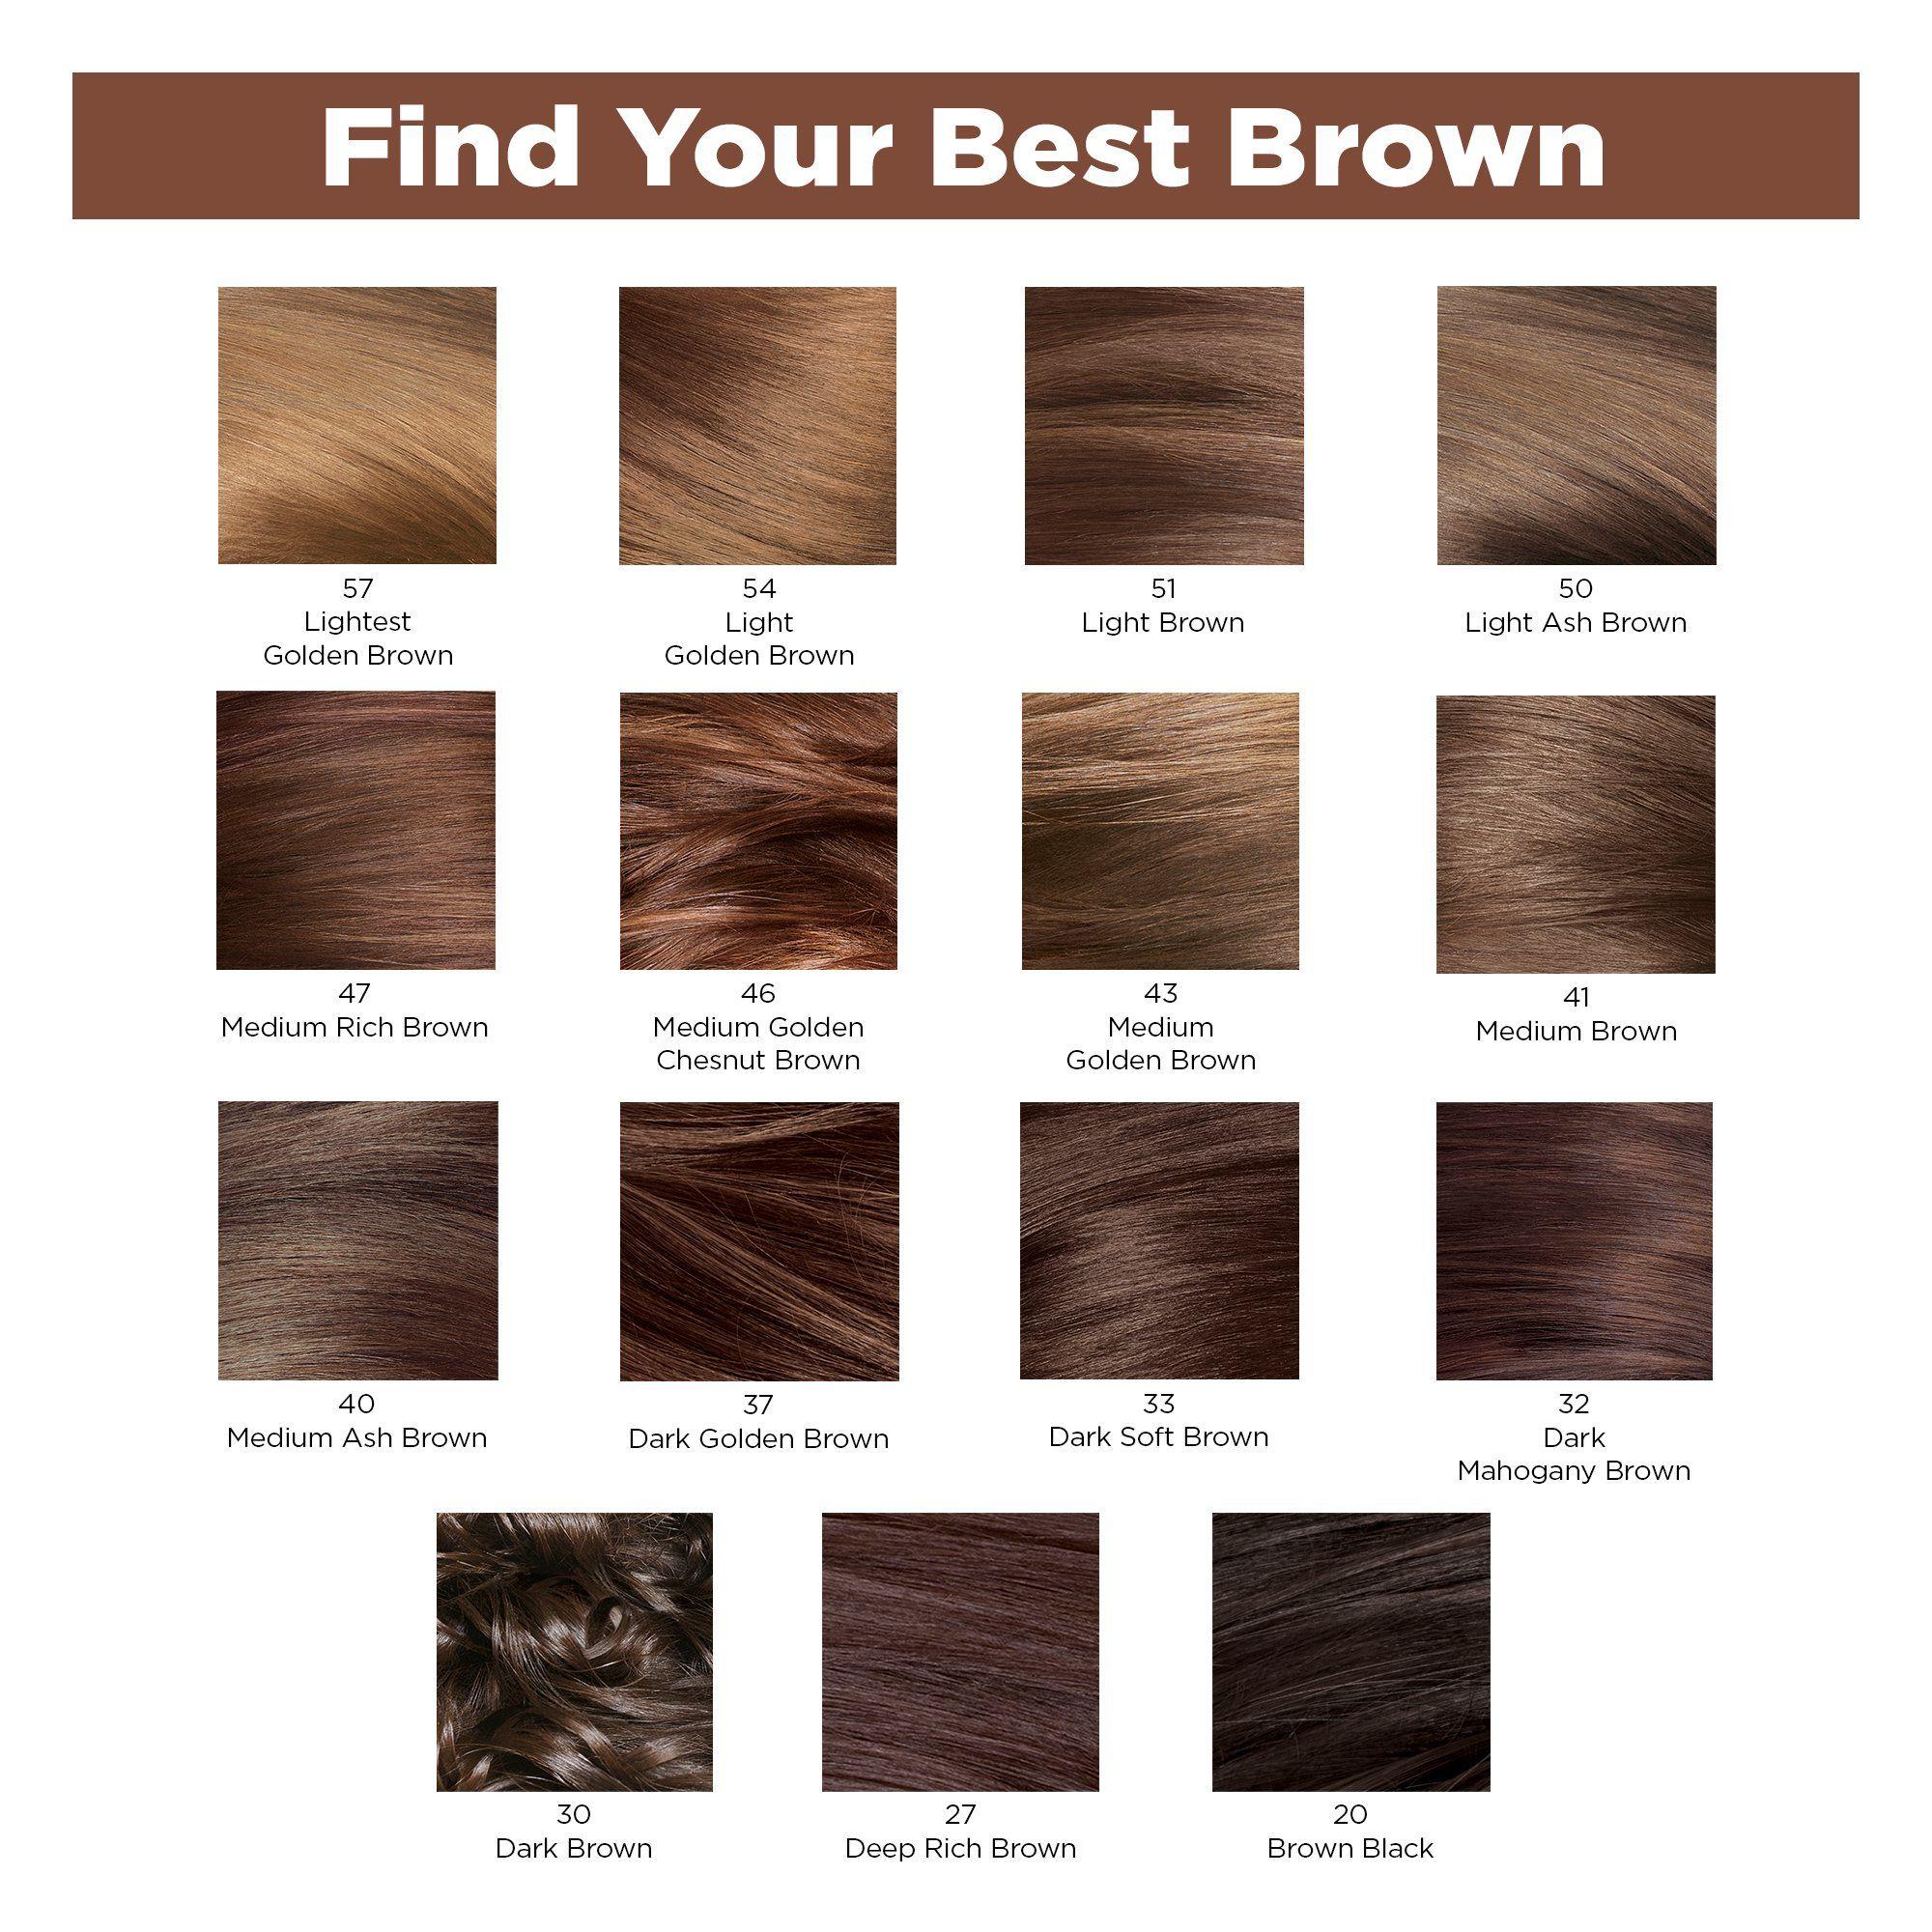 Revlon Colorsilk Beautiful Color Permanent Hair Dye With Keratin 100 Gray Coverage Ammonia Free 33 Dark Soft Brown Walmart Com In 2020 Hair Color Chart Brown Hair Color Chart Soft Brown Hair